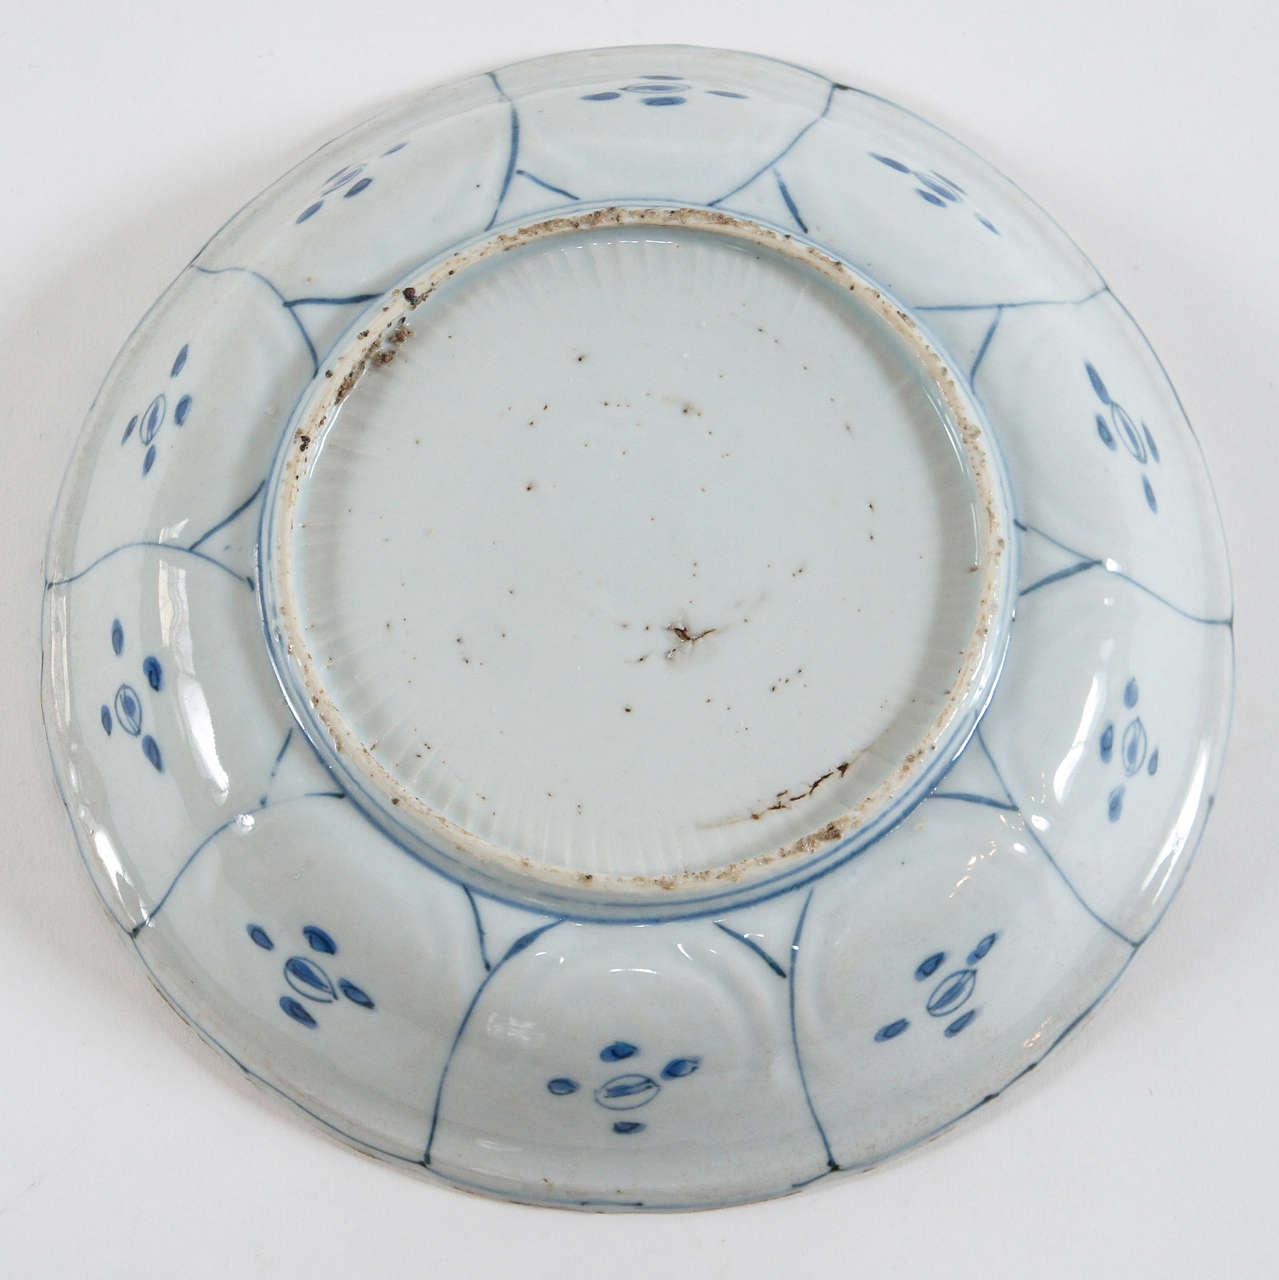 Kraak Ming Porcelain Blue And White Shallow Bowl China